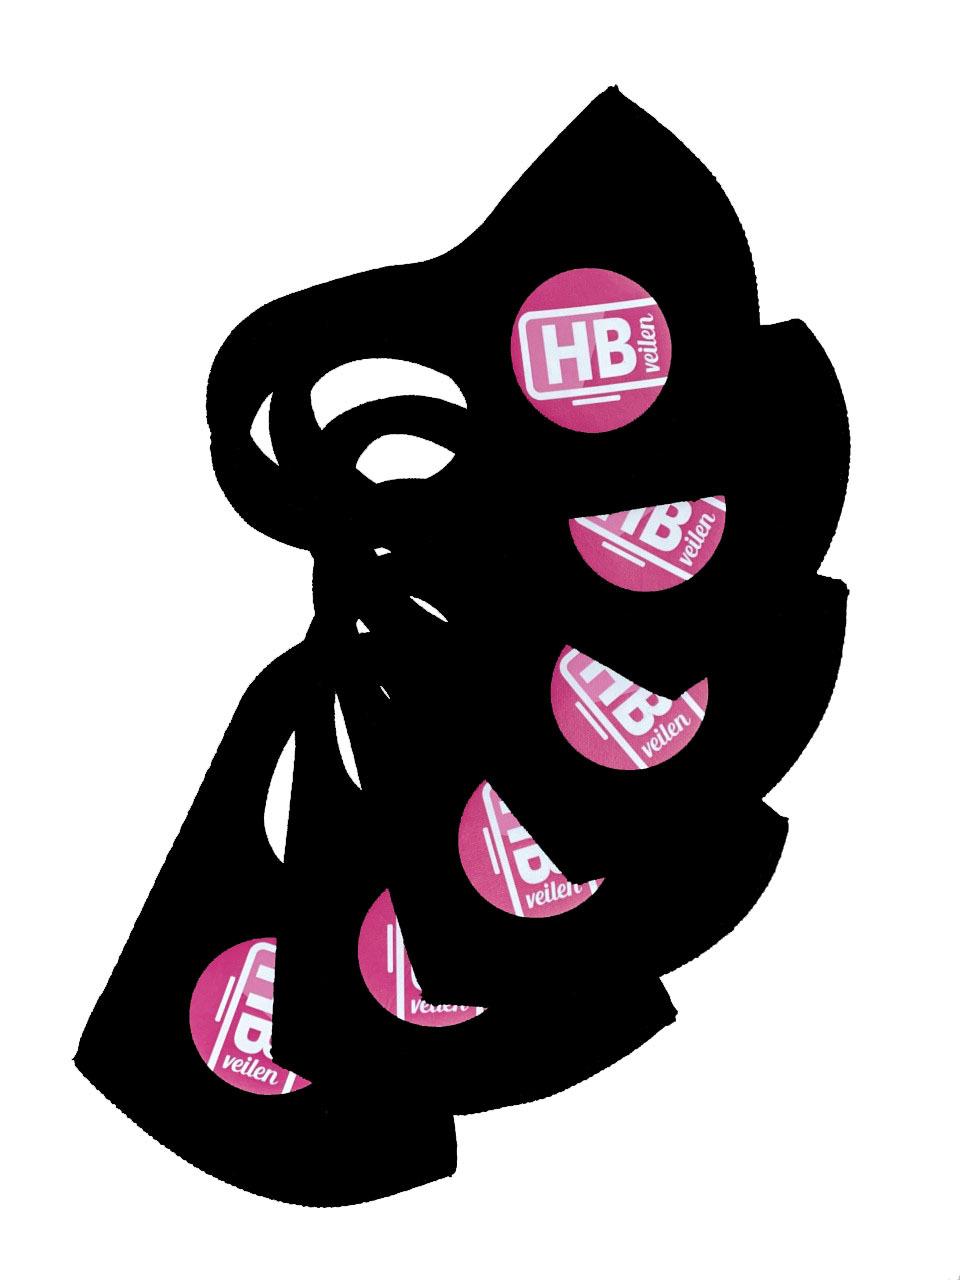 HB veilen